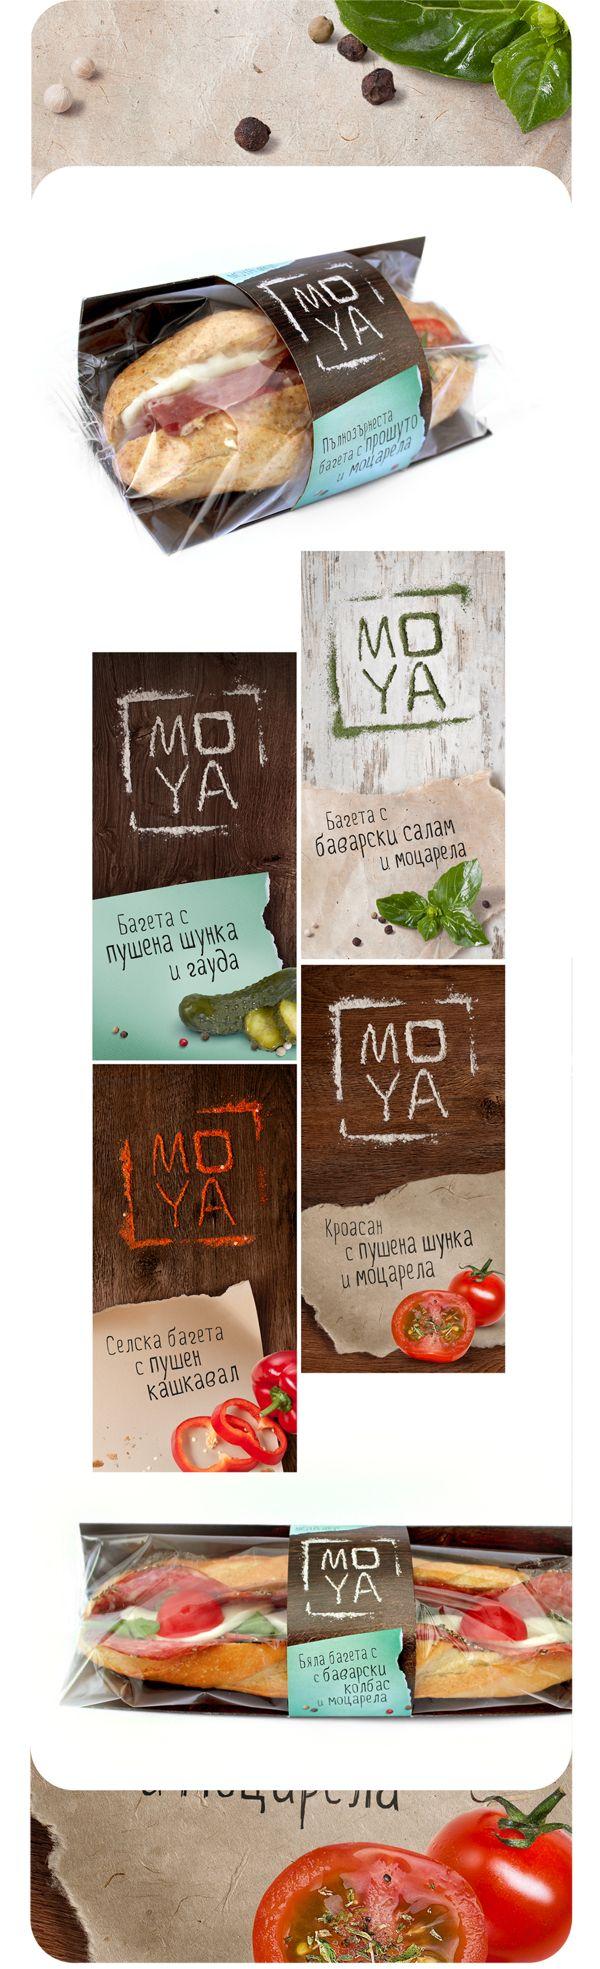 Moya sandwiches by Boyko Taskov, via Behance I love this #sandwich #packaging PD